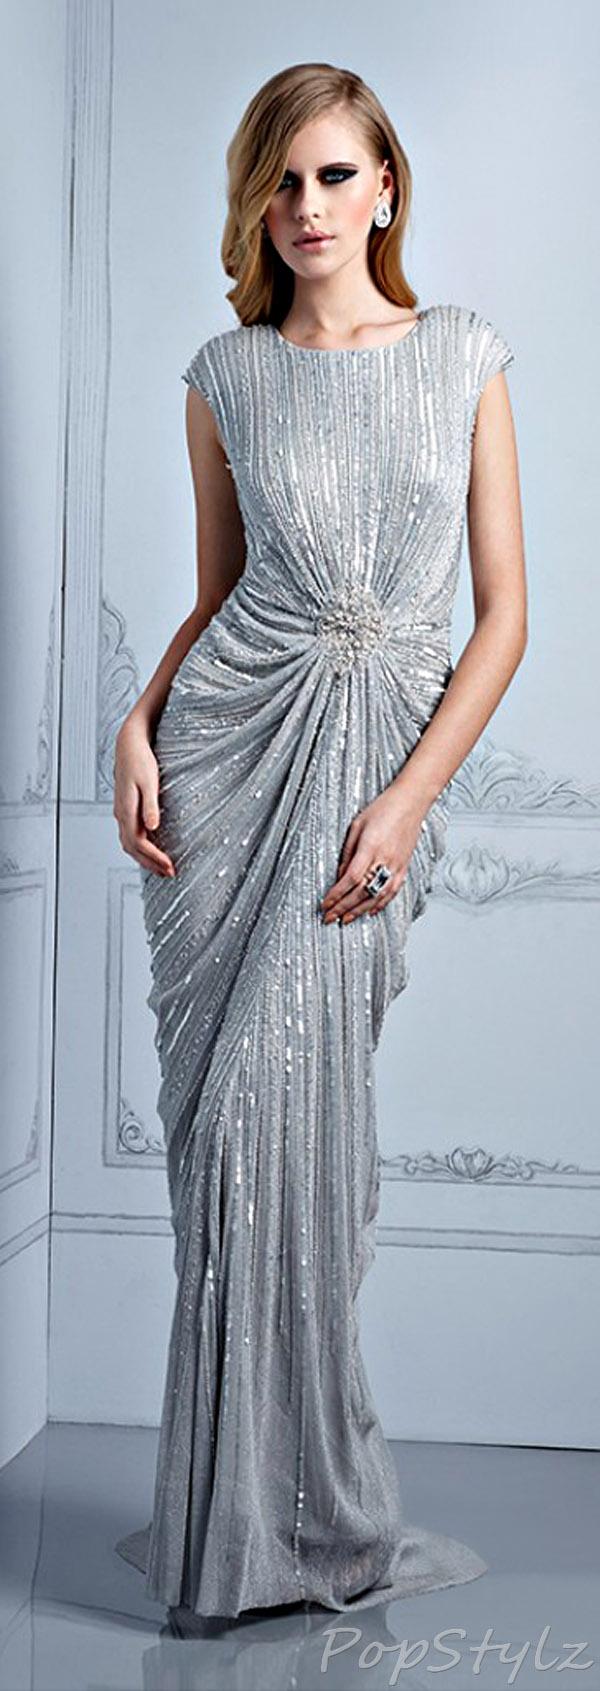 Terani Couture M2242 Evening Fall 2013 Dress